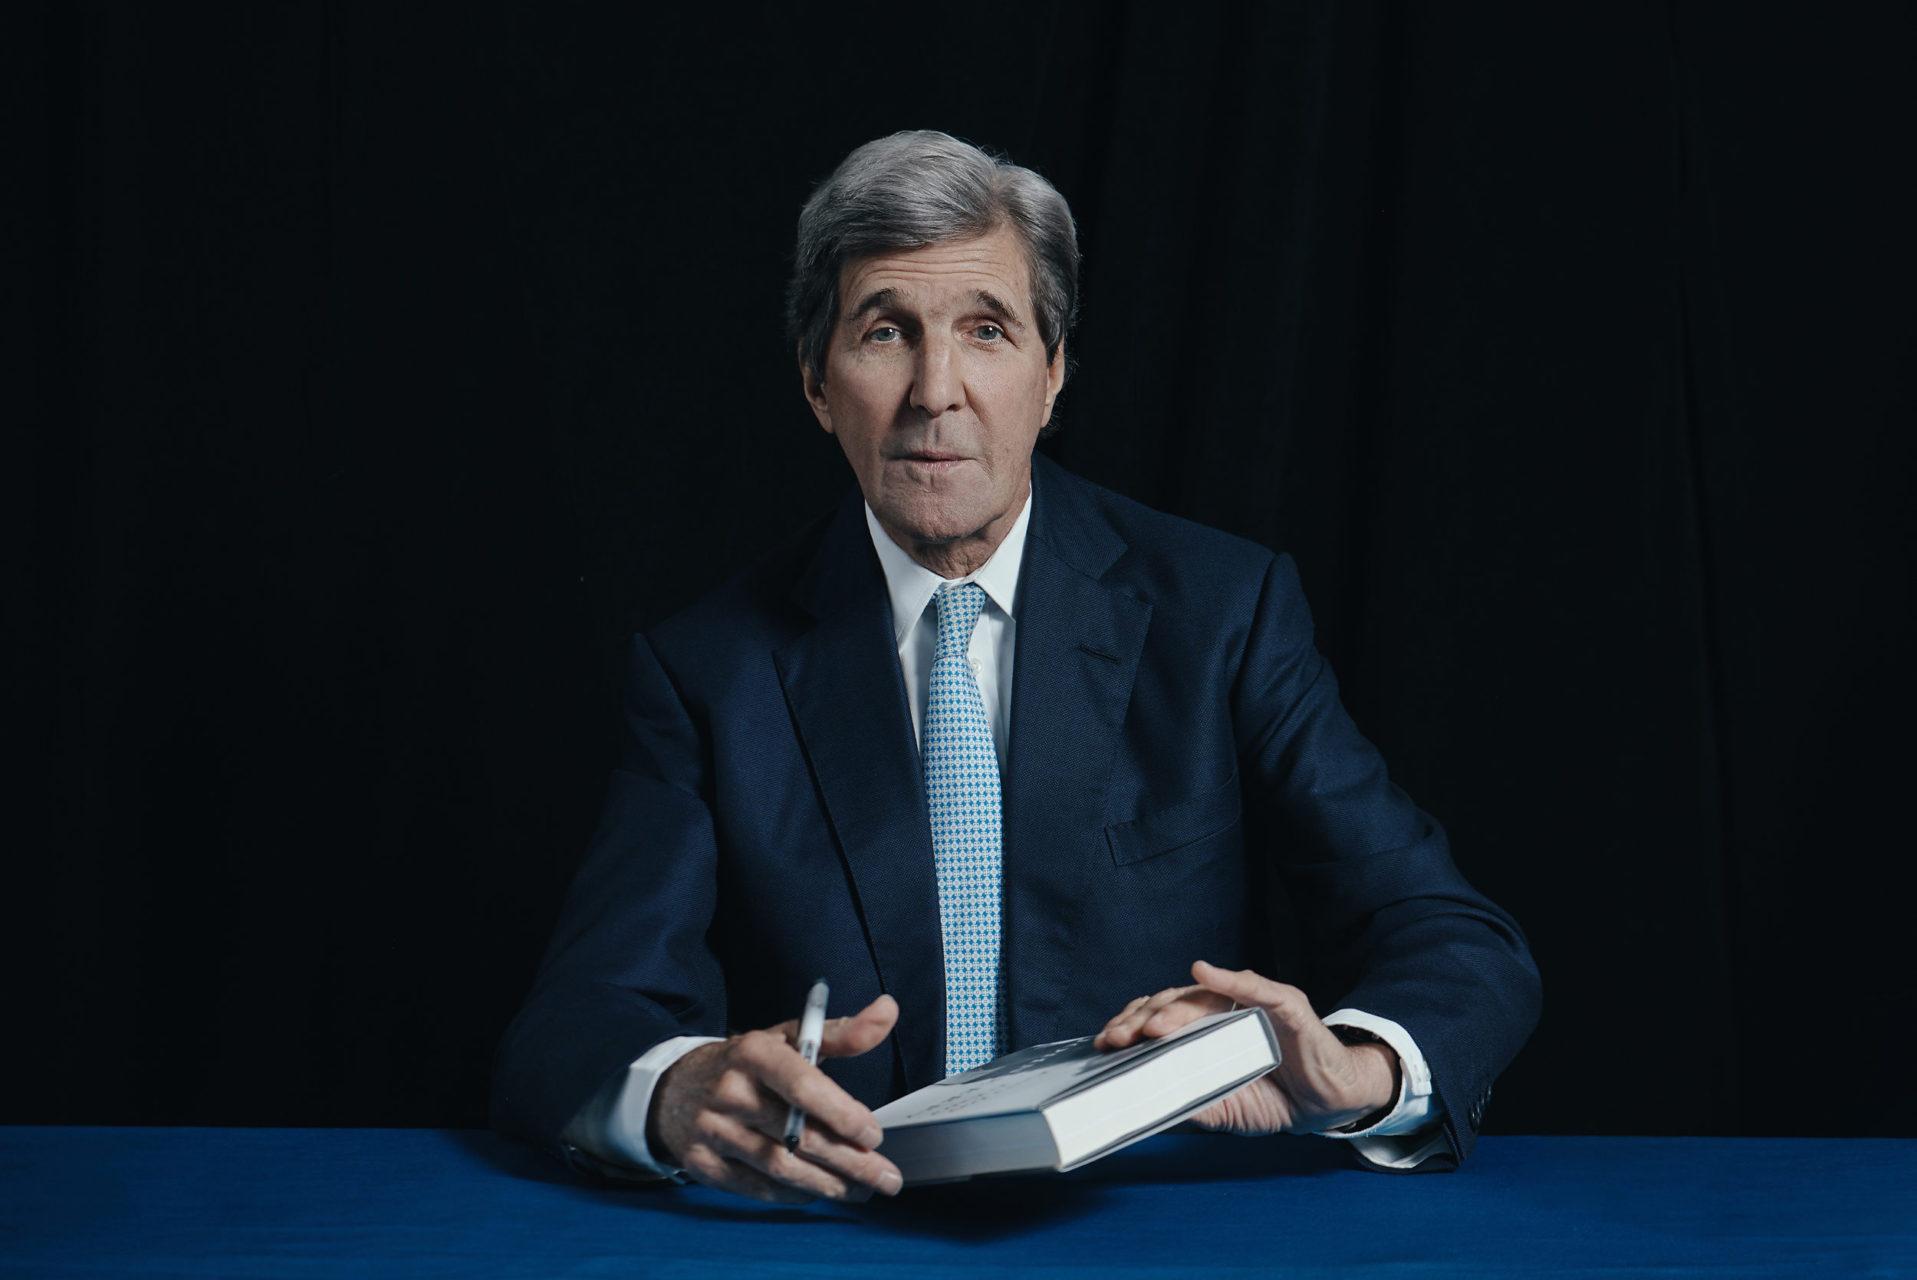 John Kerry, former National Secretary